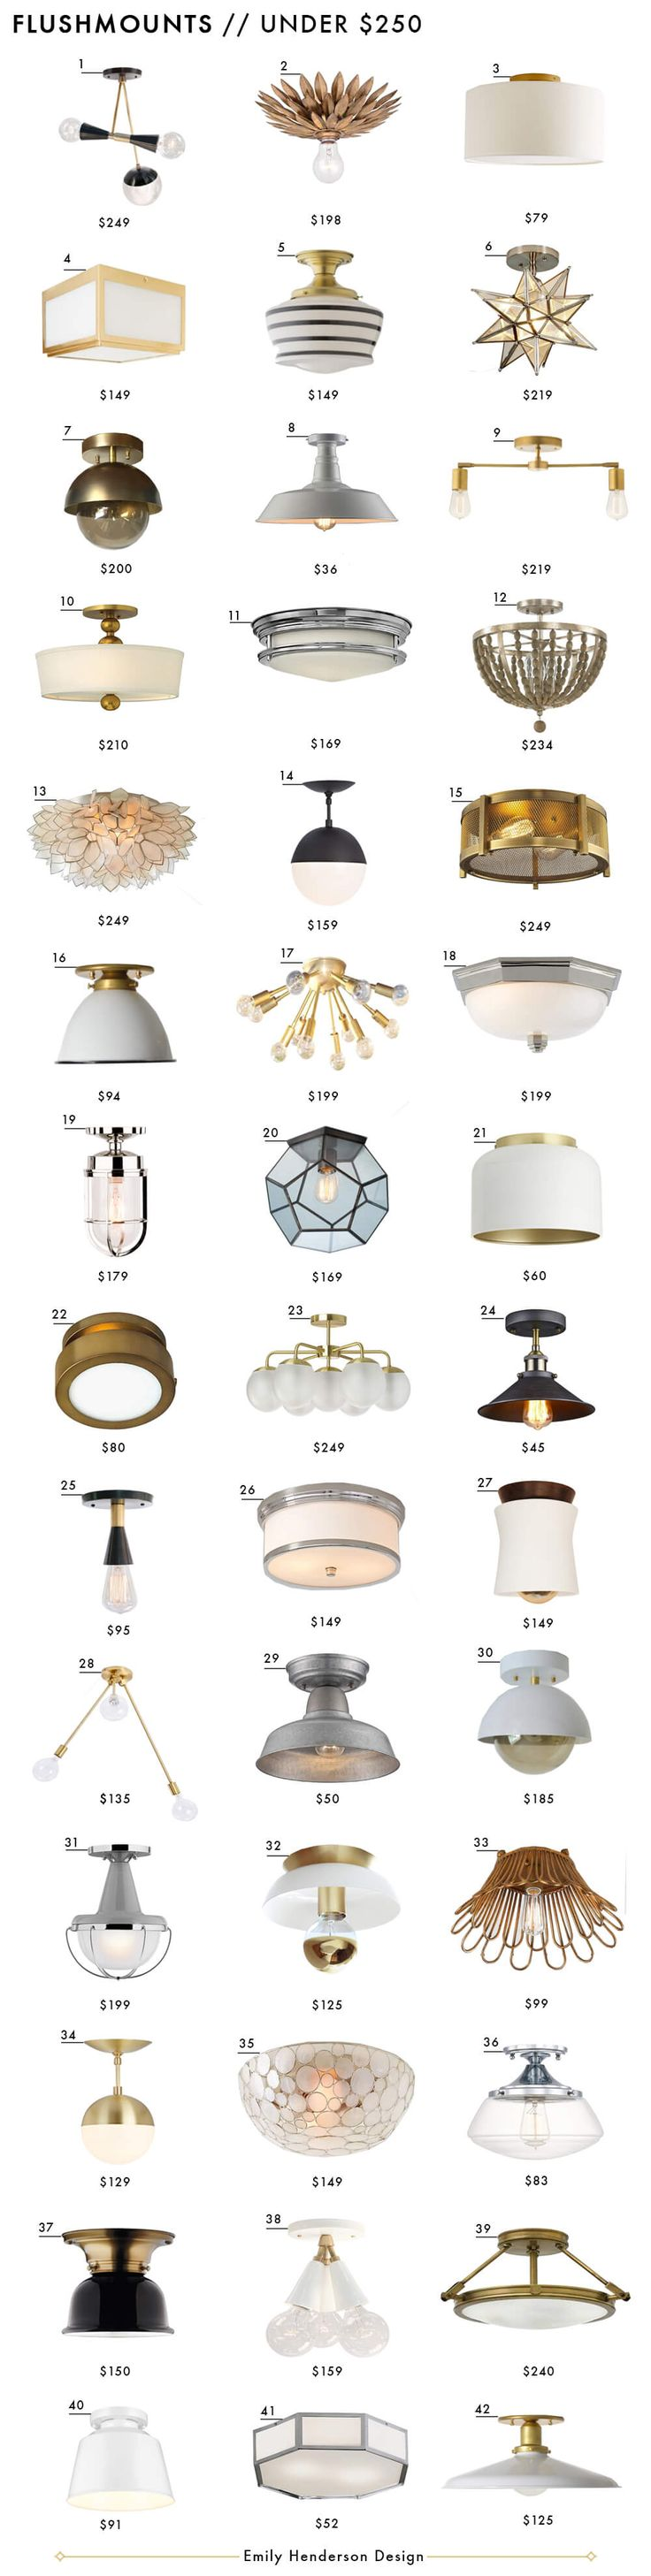 best kc interiors images on pinterest decorations paint and